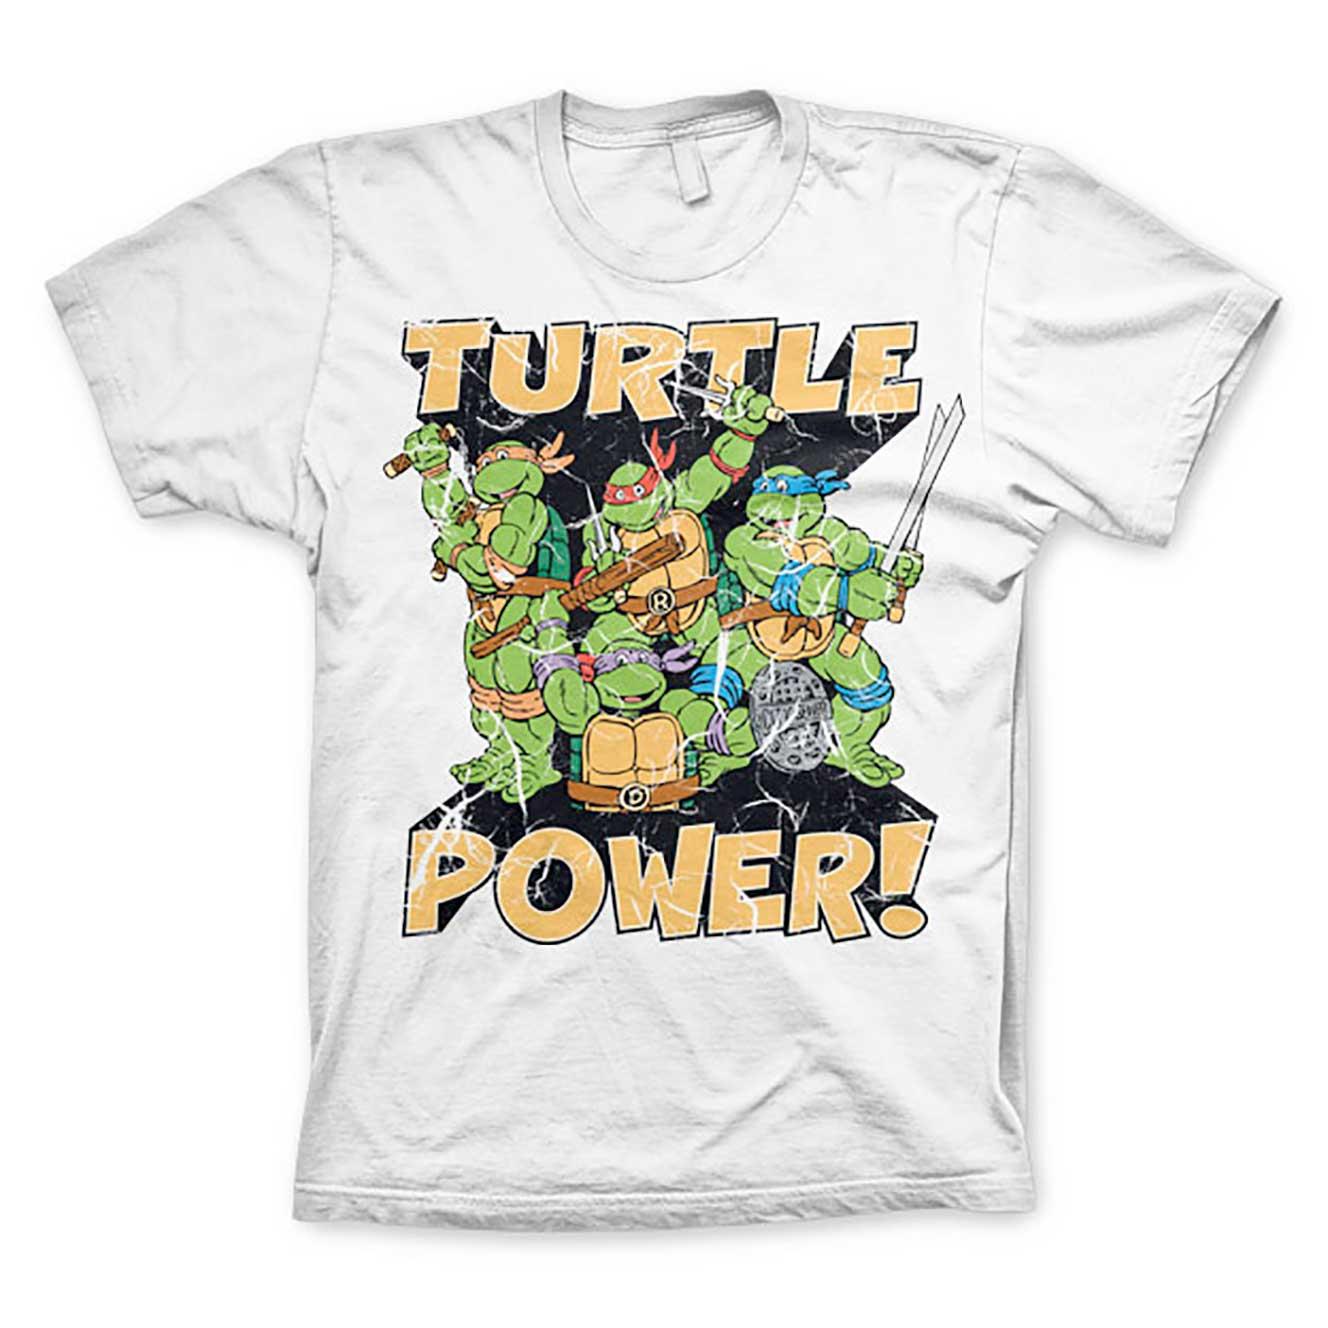 turtles-turtle-power-t-shirt